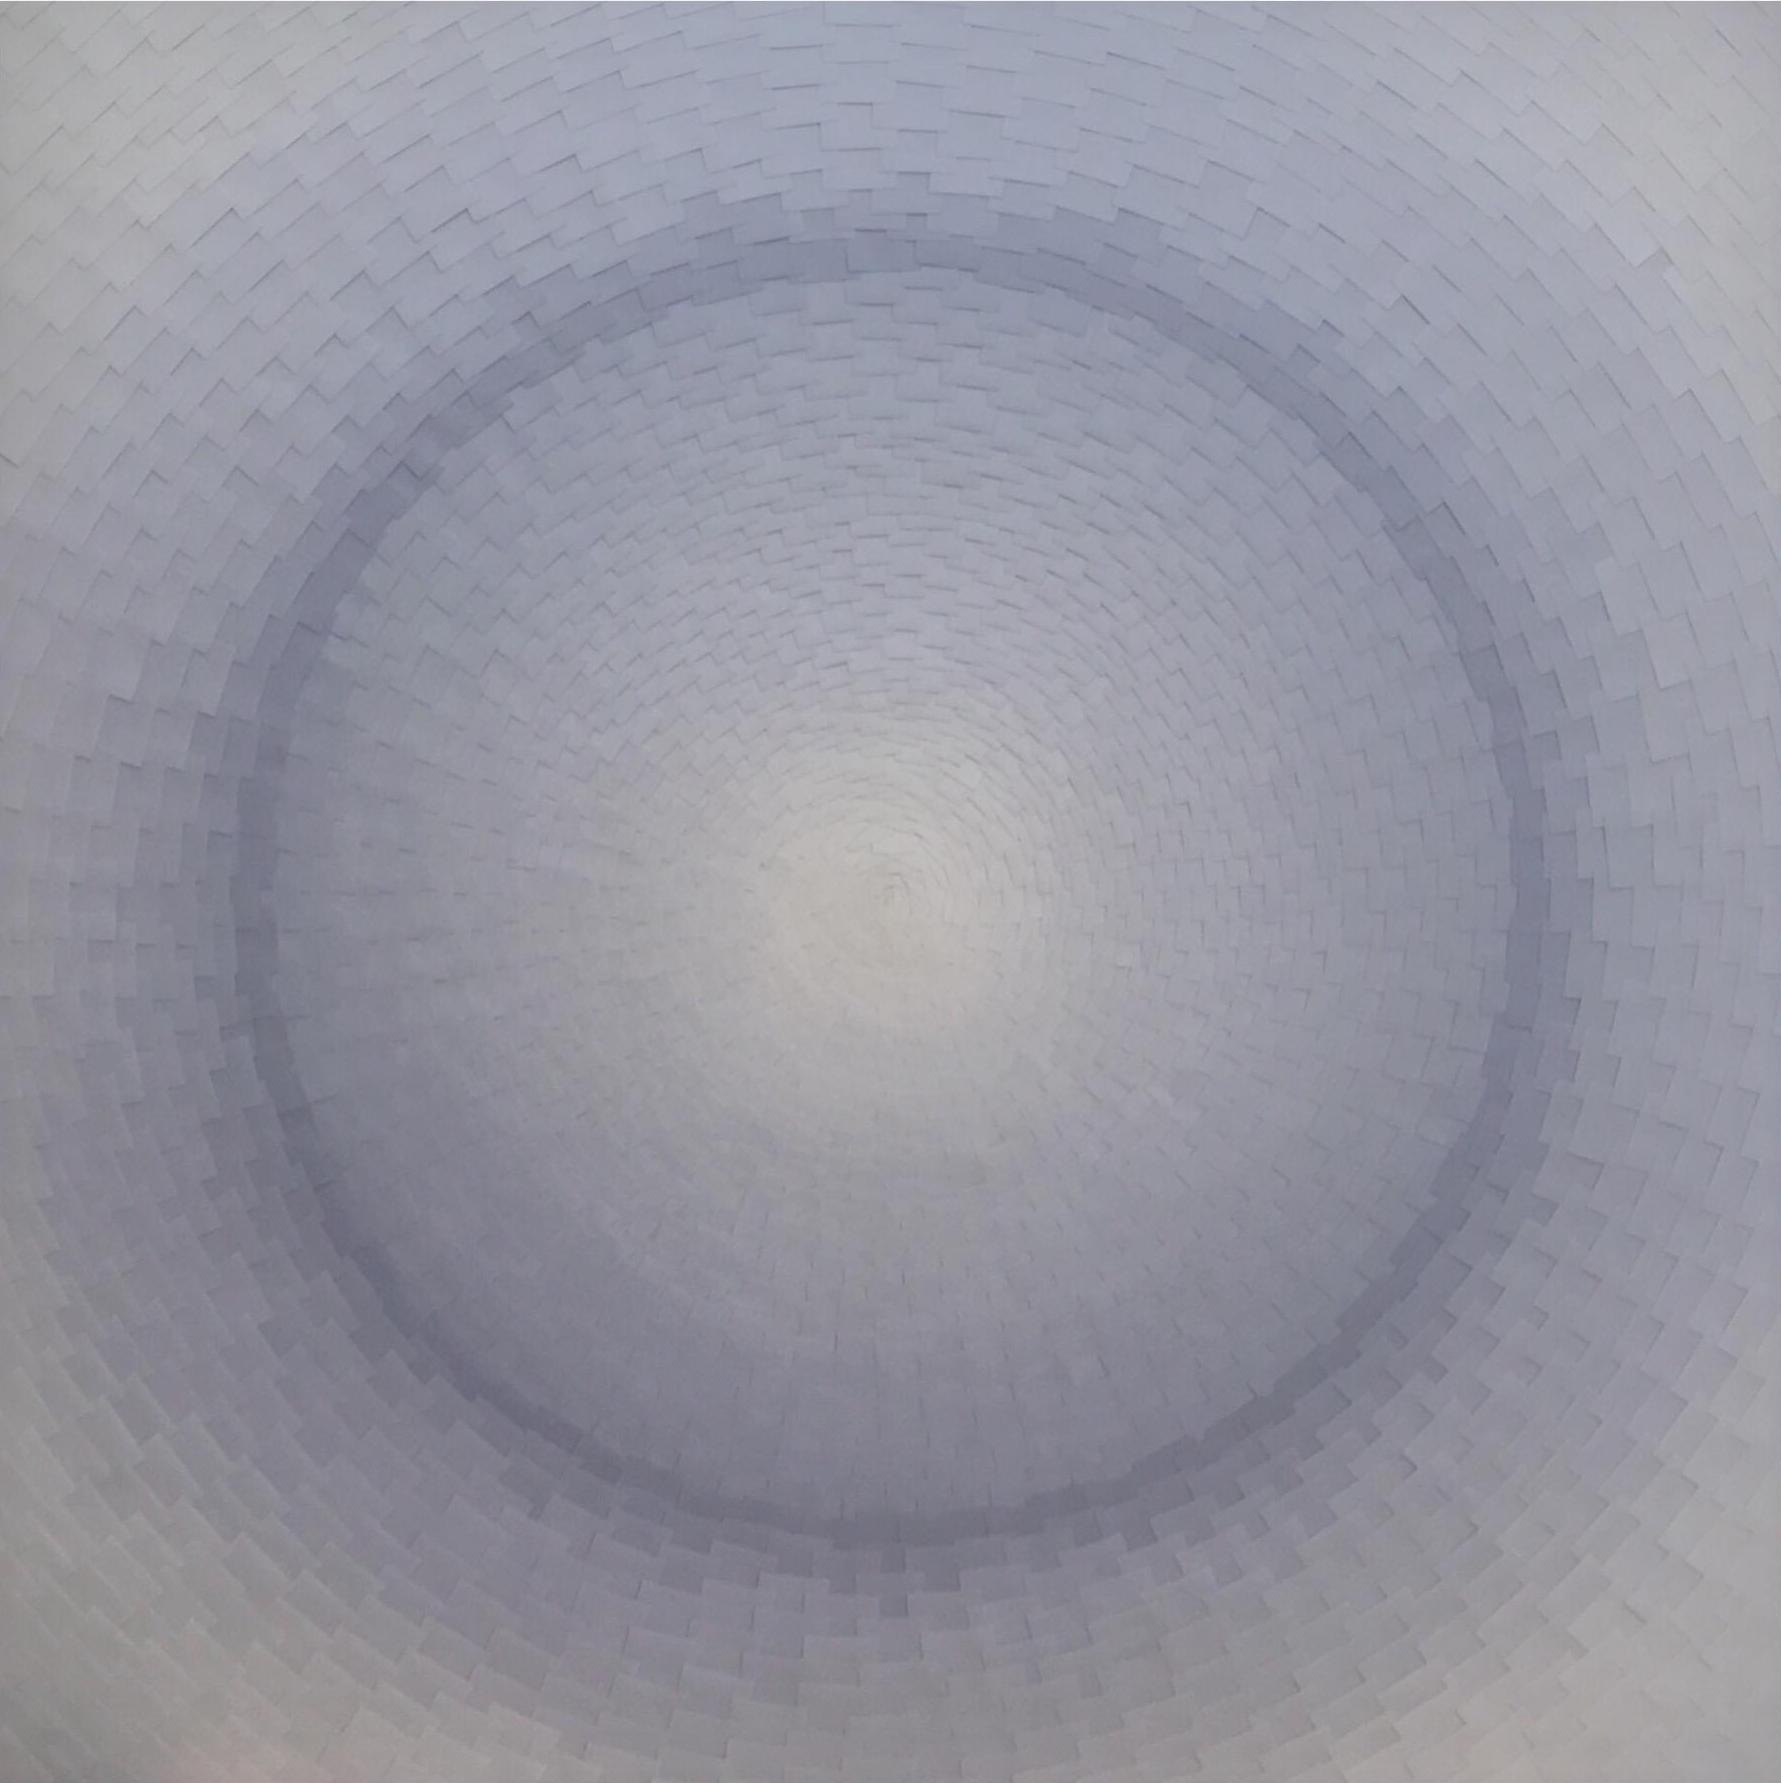 Untitled Sphere48x48x2.jpg